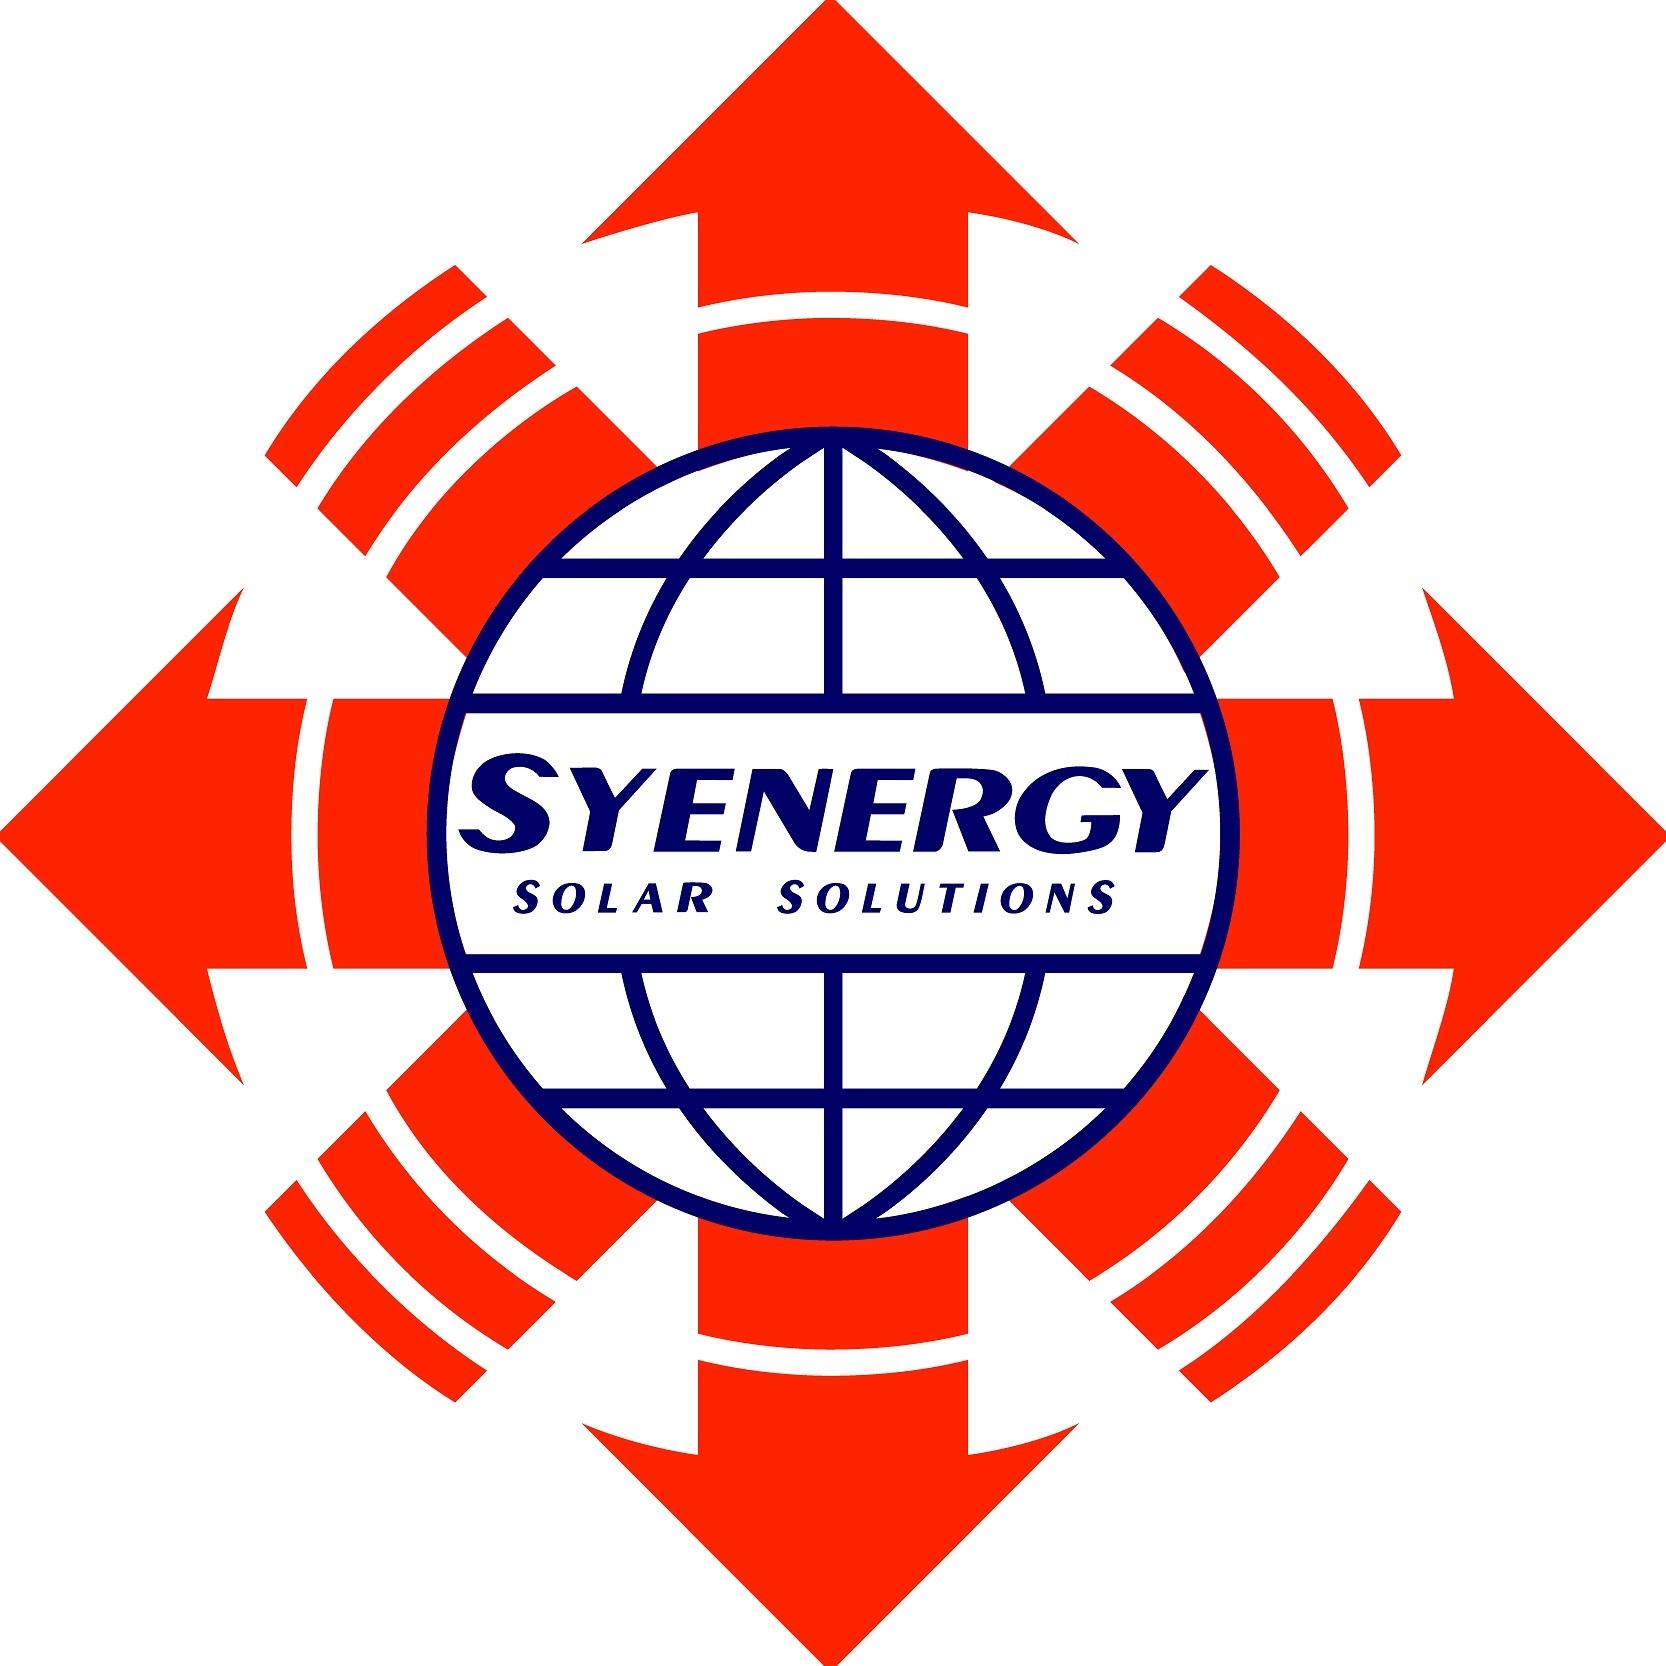 ✴ ТОВ «Сіенерджи» ✴ ООО «Сиэнерджи» ✴ «SYENERGY» LLC ✴